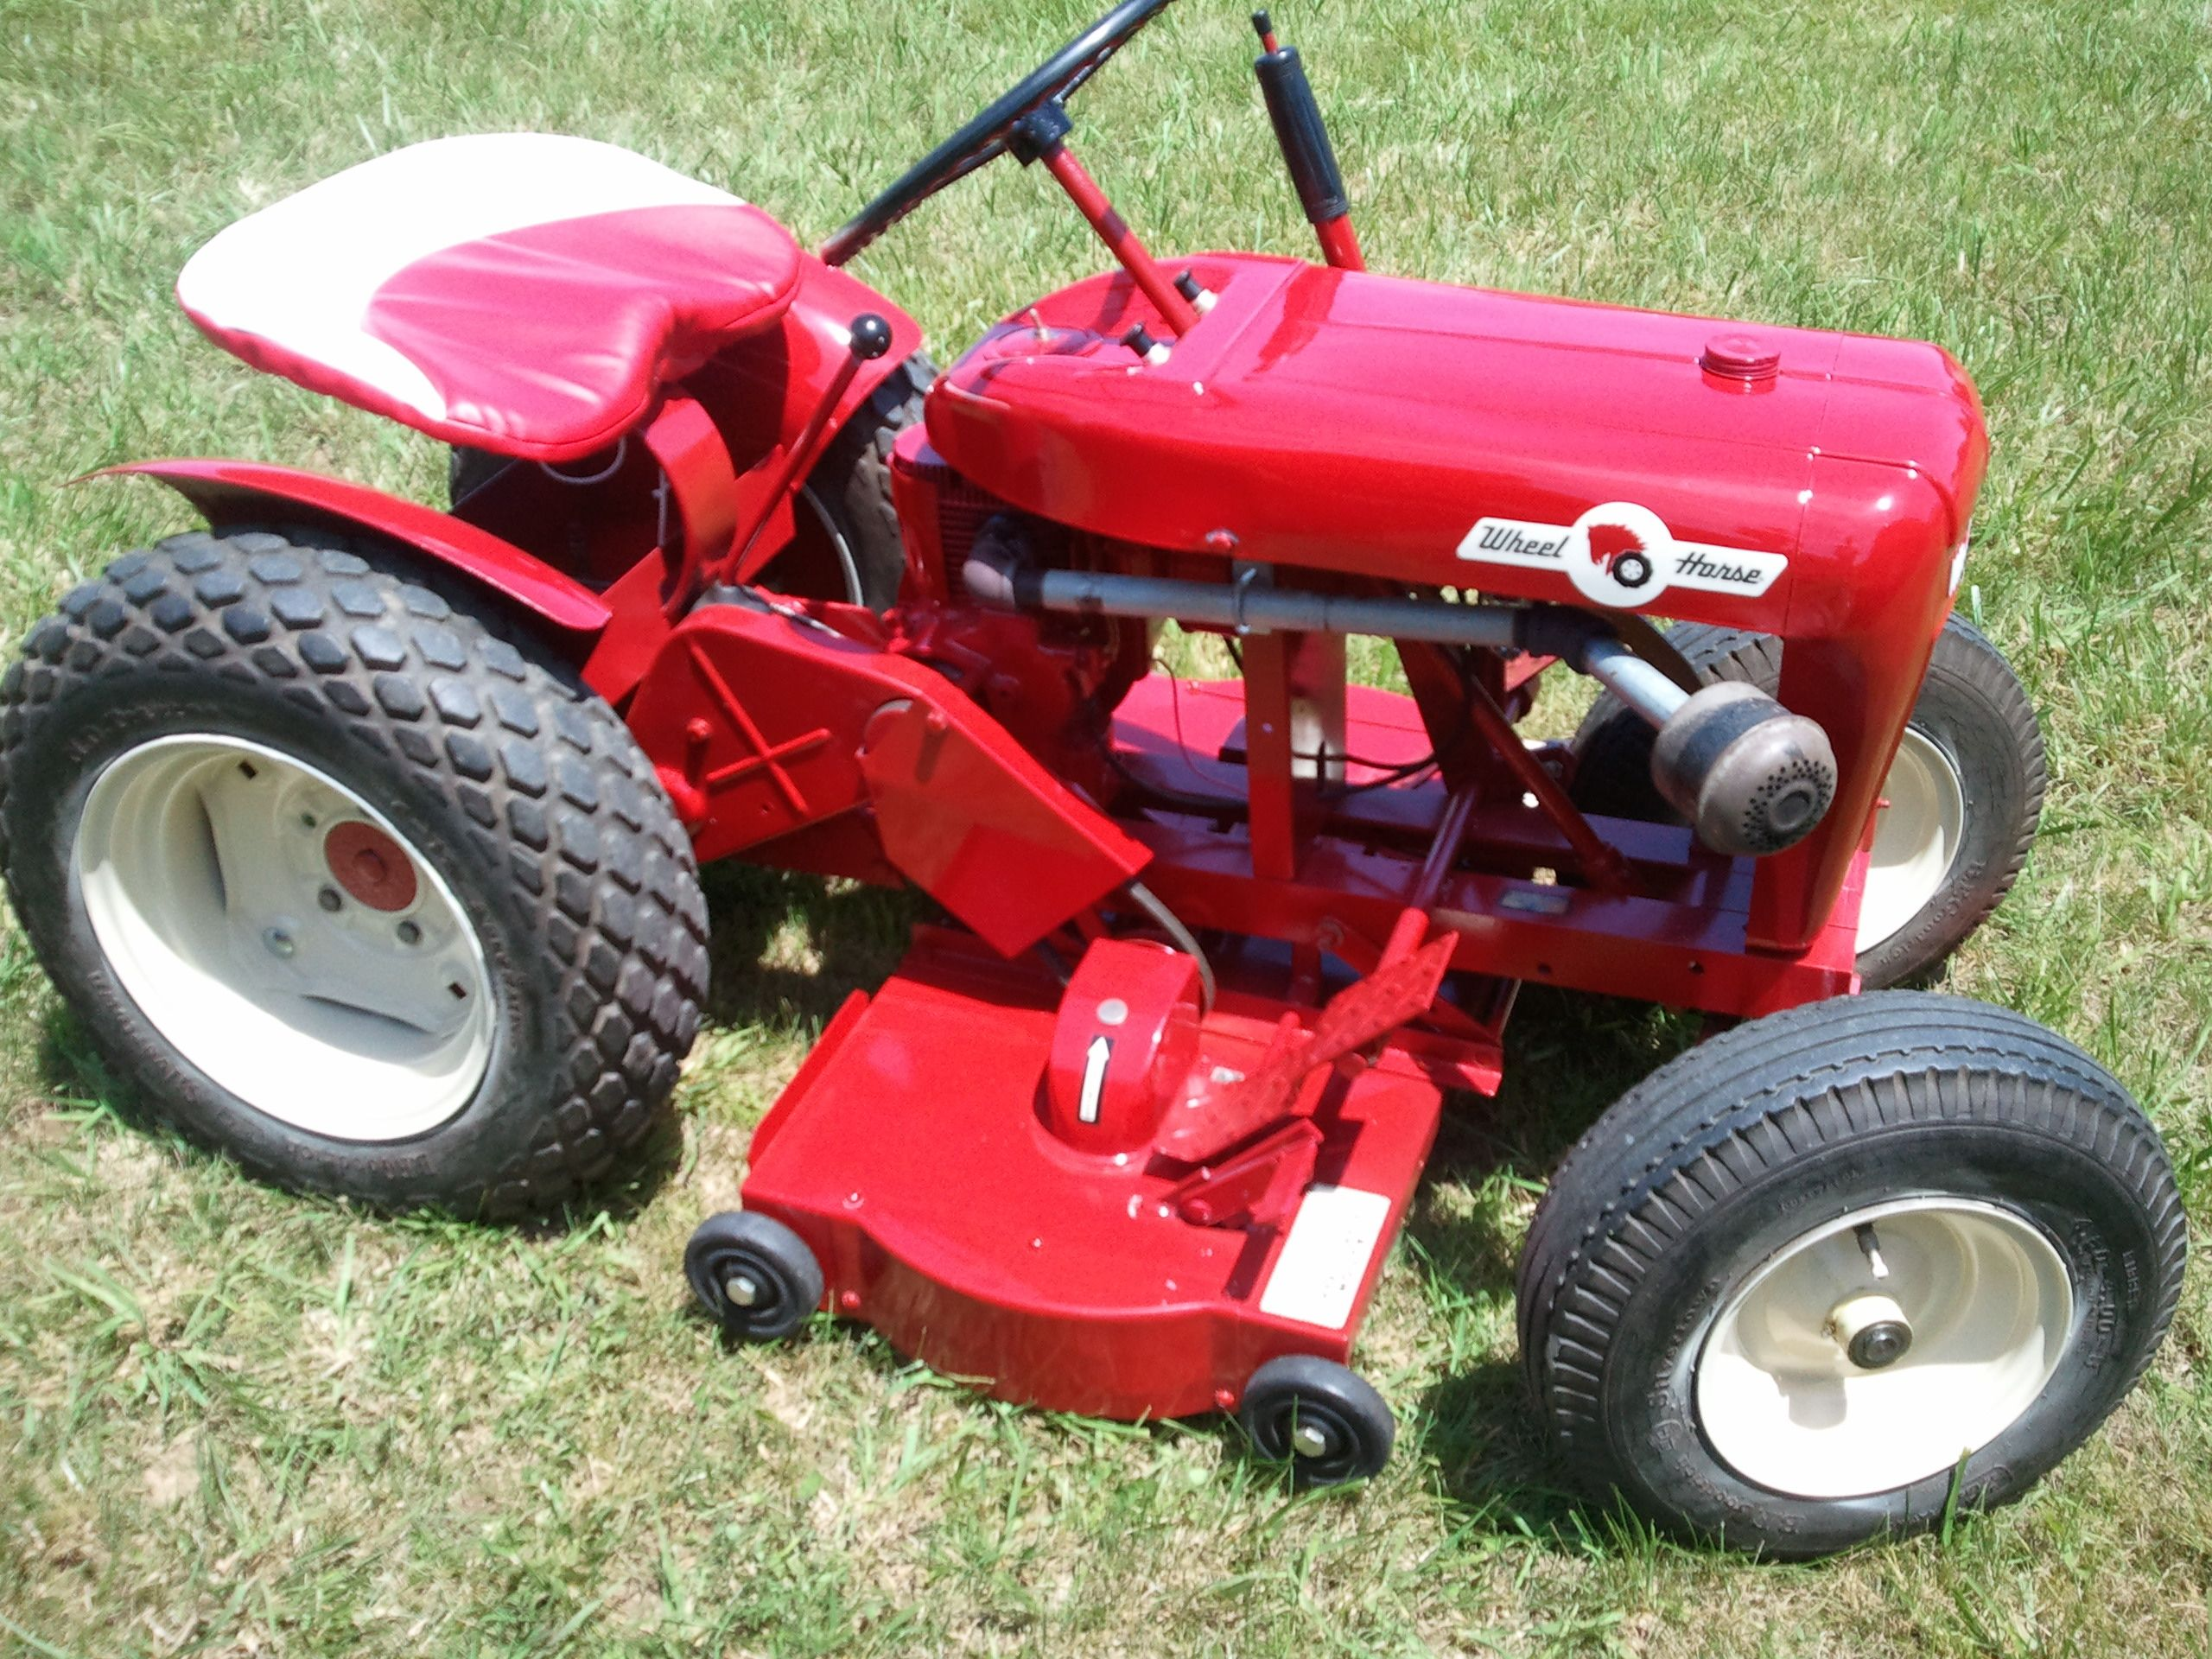 Wiring Diagram Wheel Horse Lawn Tractor : Wheel horse garden tractor pulling wiring diagrams